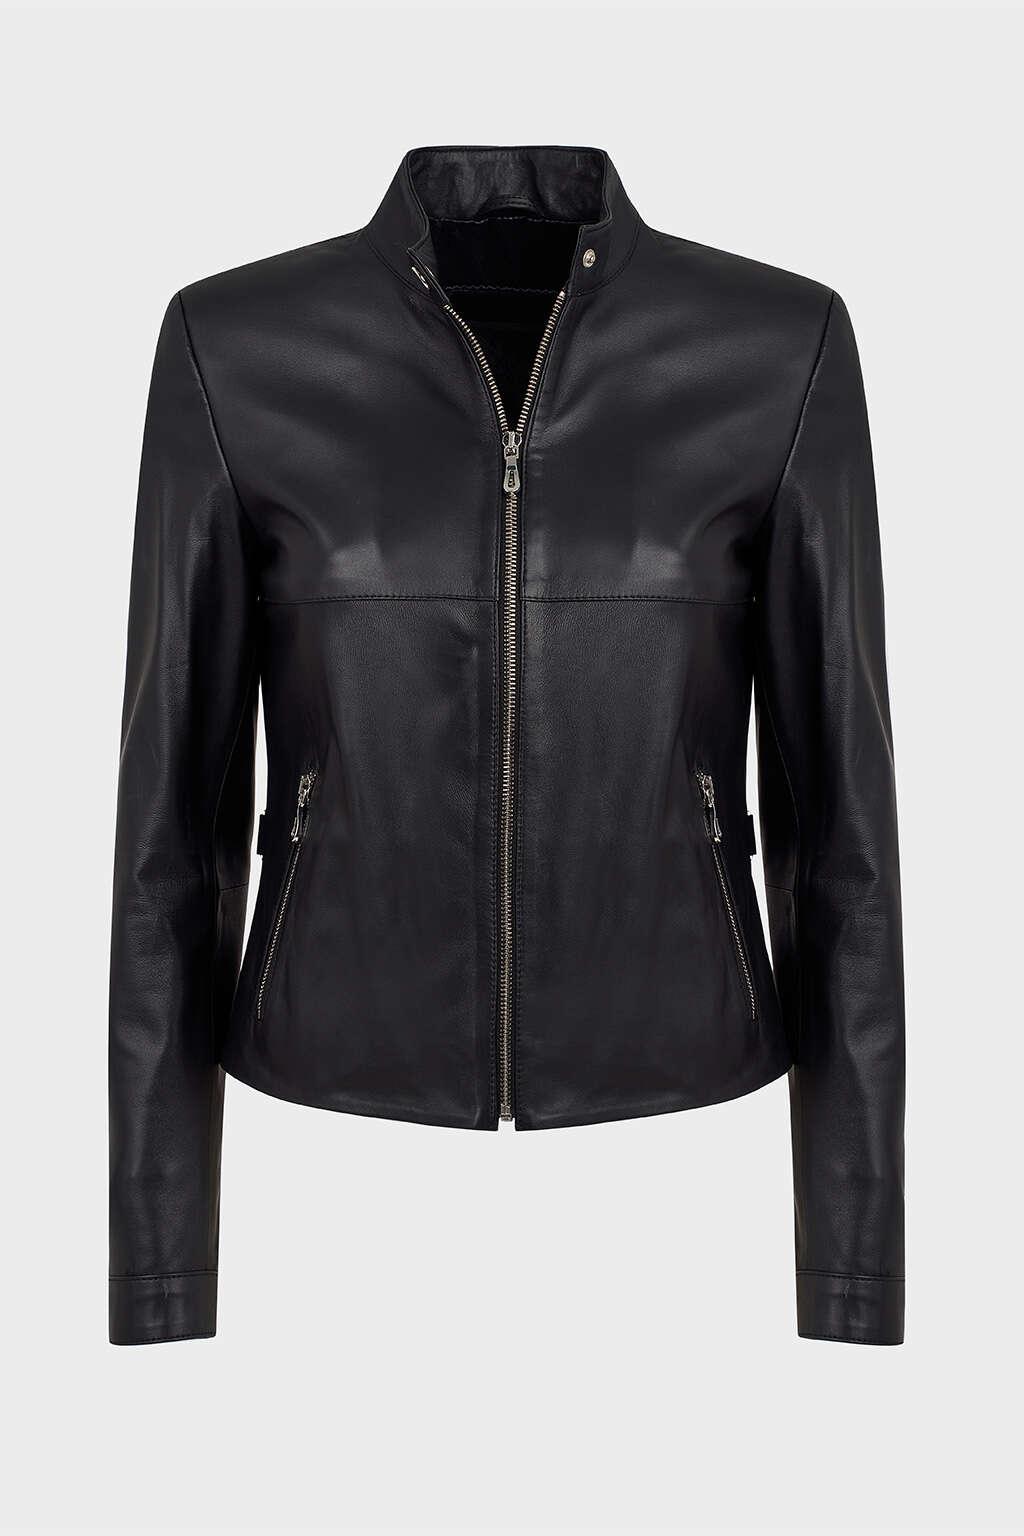 Front of Jet Black Leather Moto Jacket